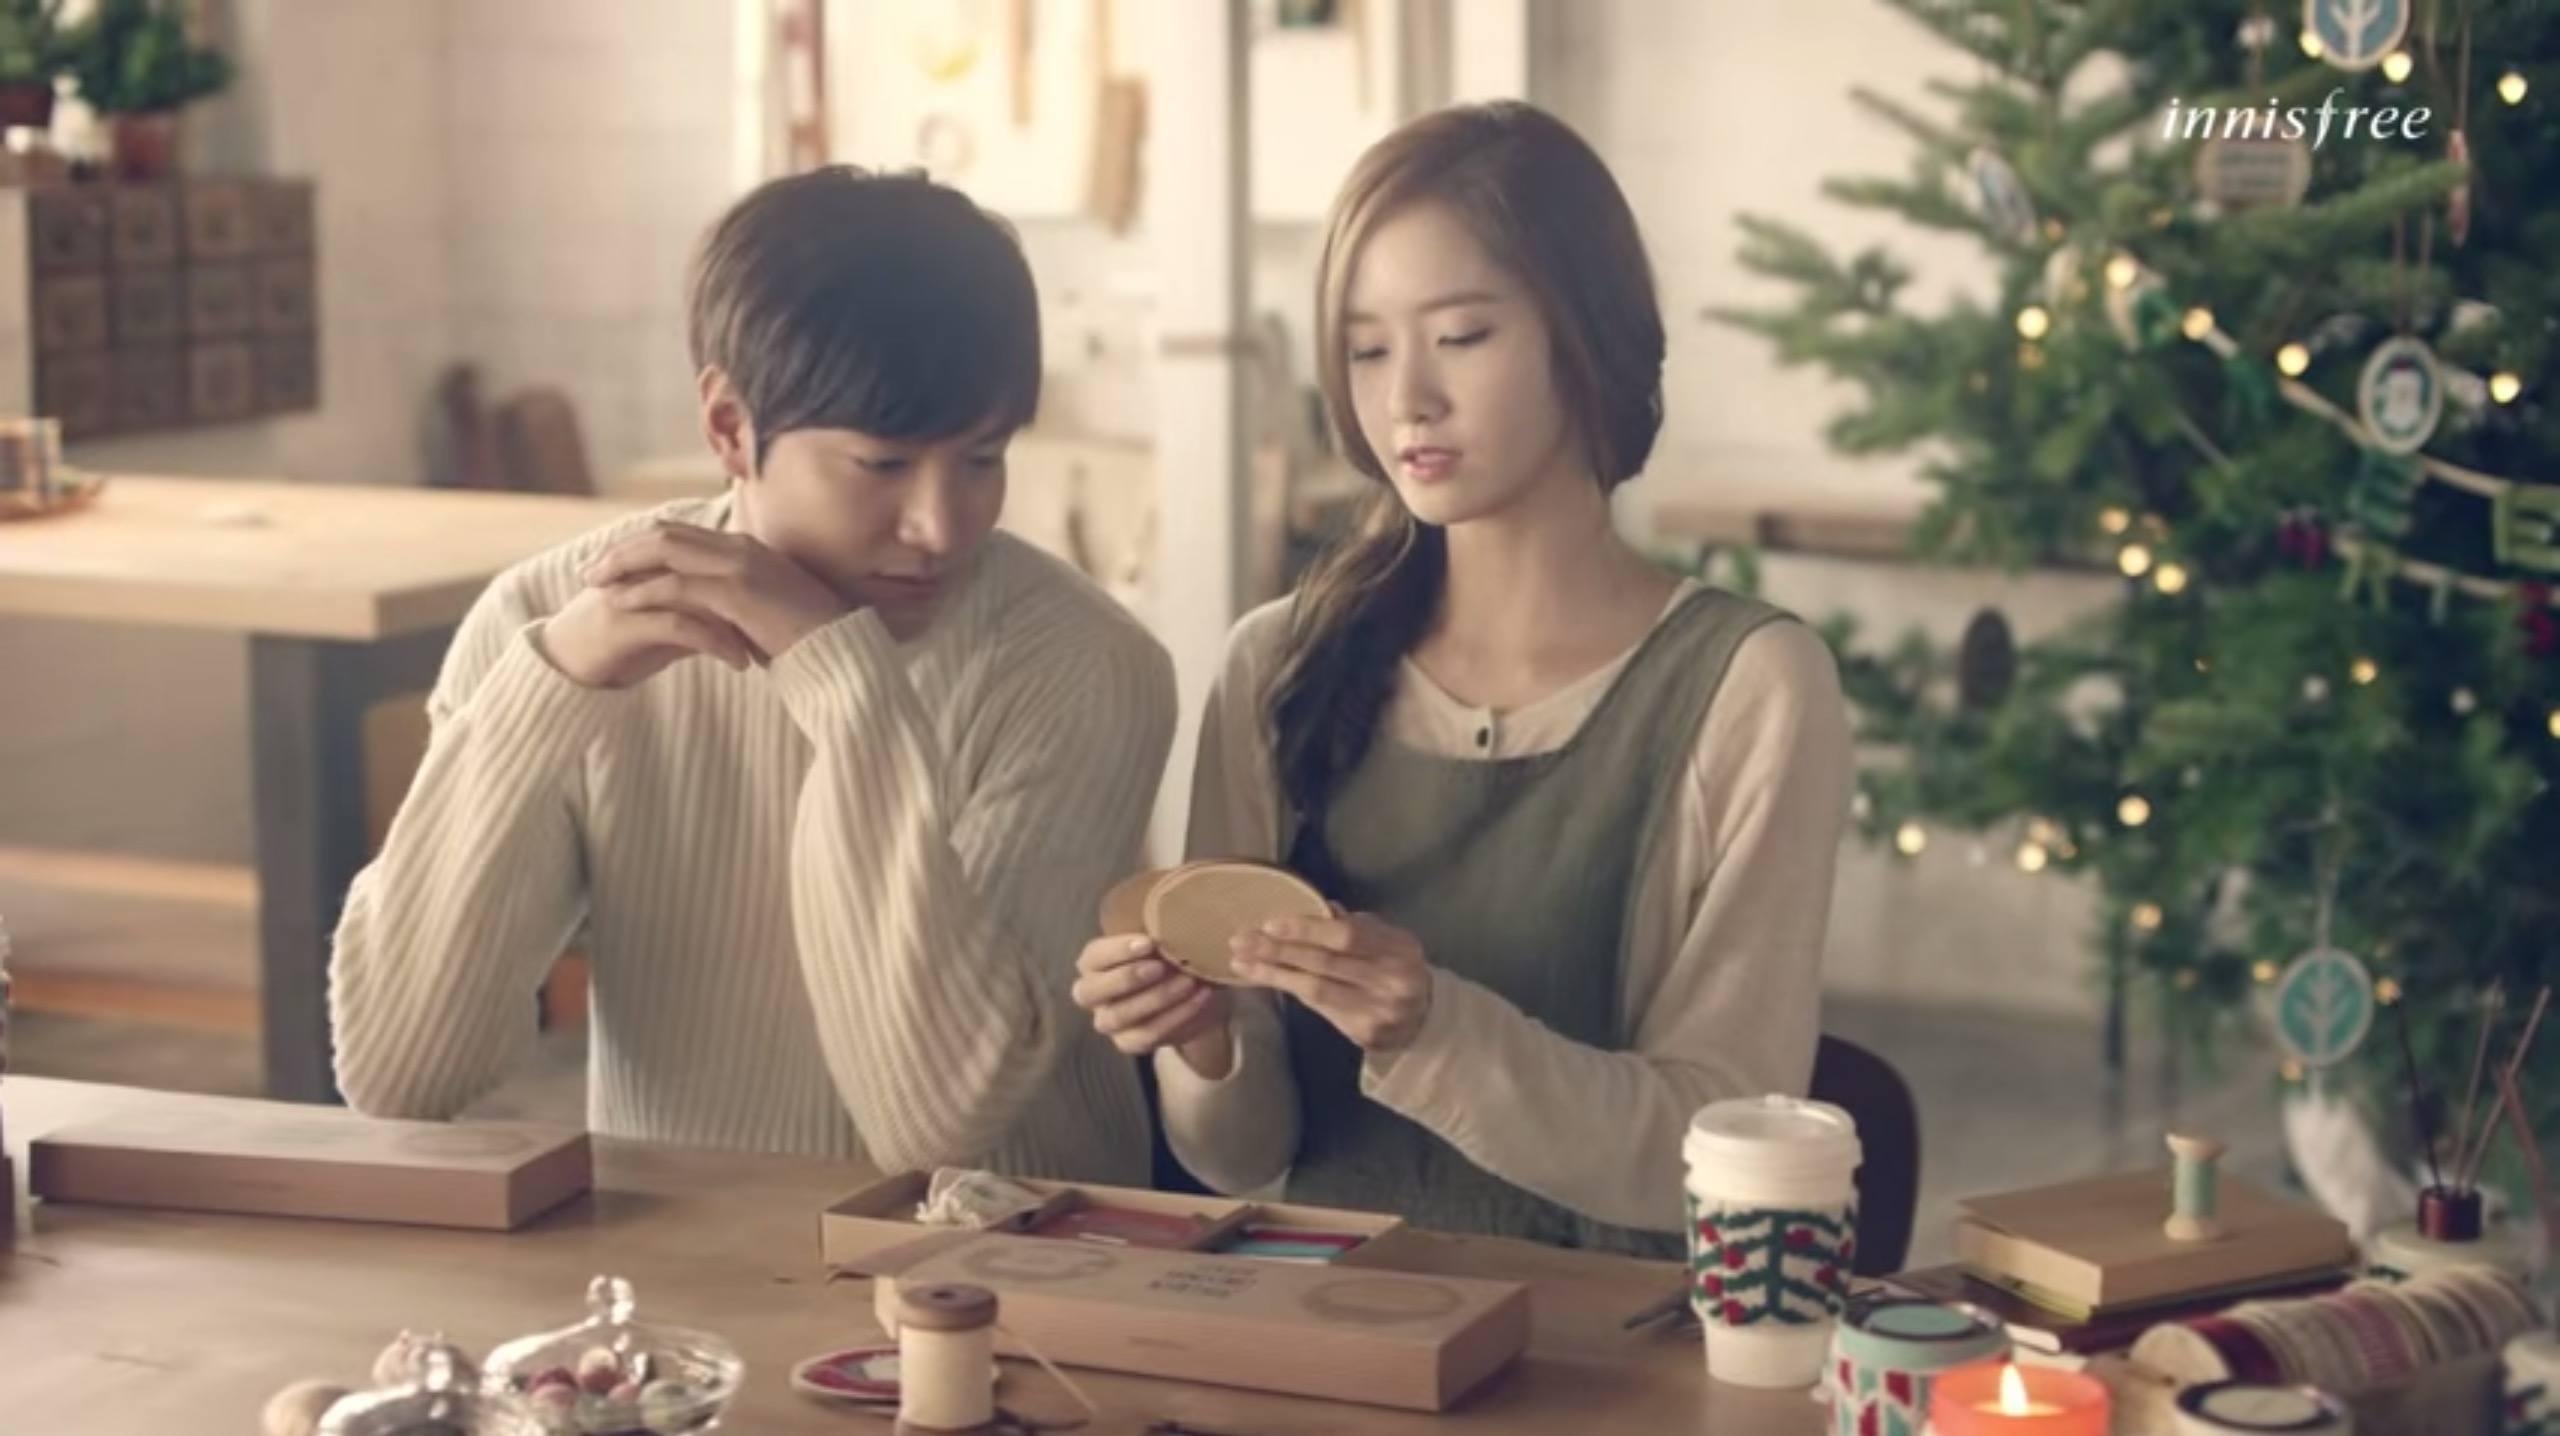 Lee min ho dating yoona korean